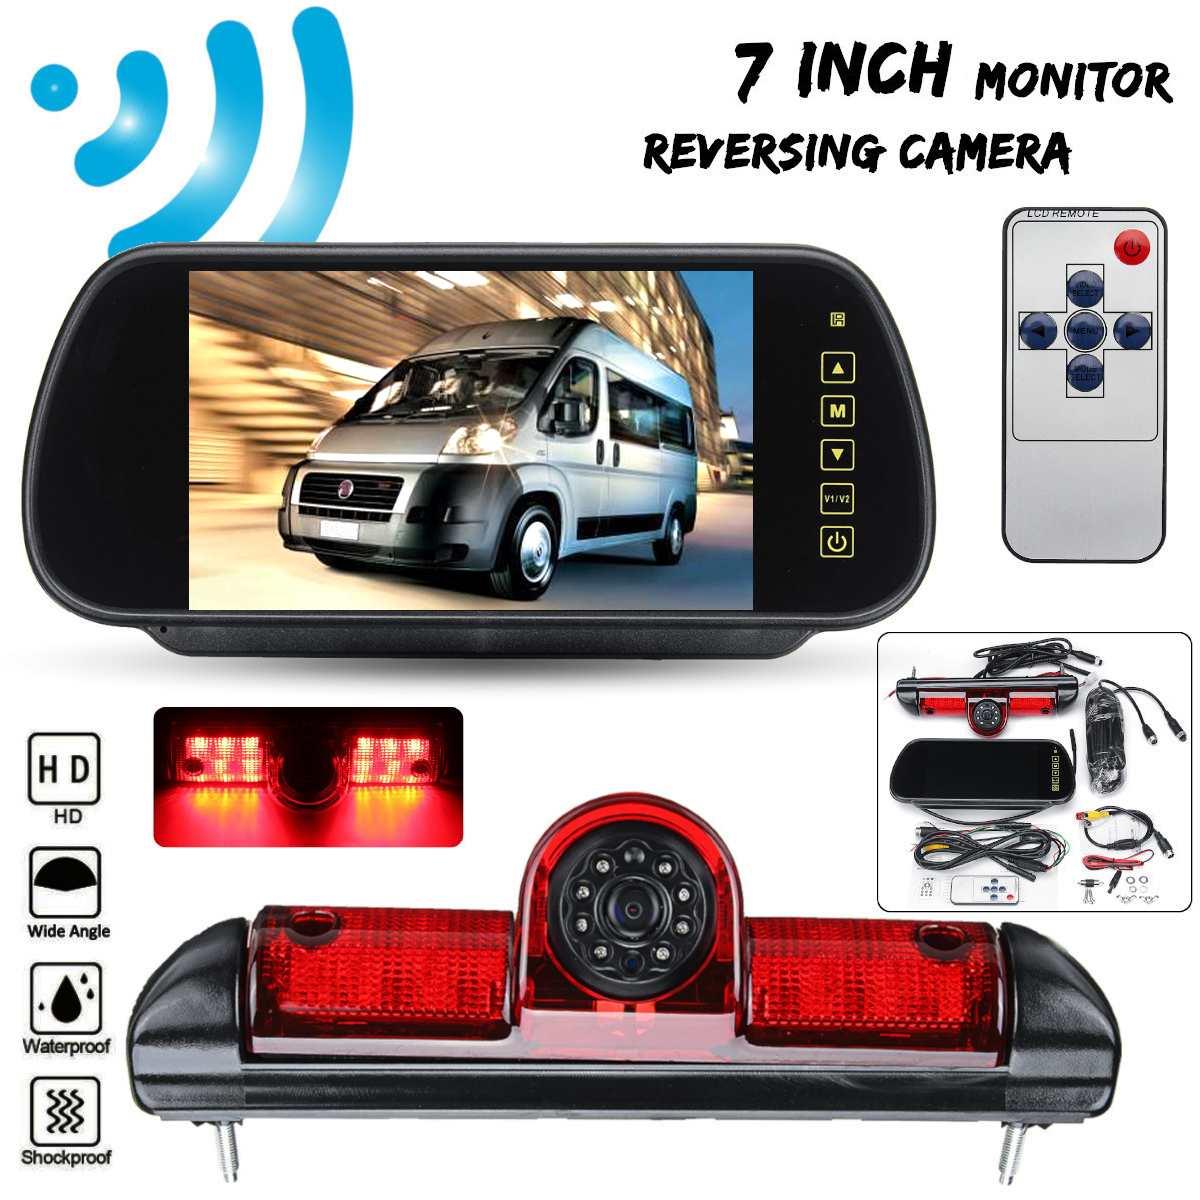 CCD HD Car Rear View Camera Reverse Backup Parking IR LED for Fiat Ducato X250 Citroen Jumper III Peugeot Boxer III